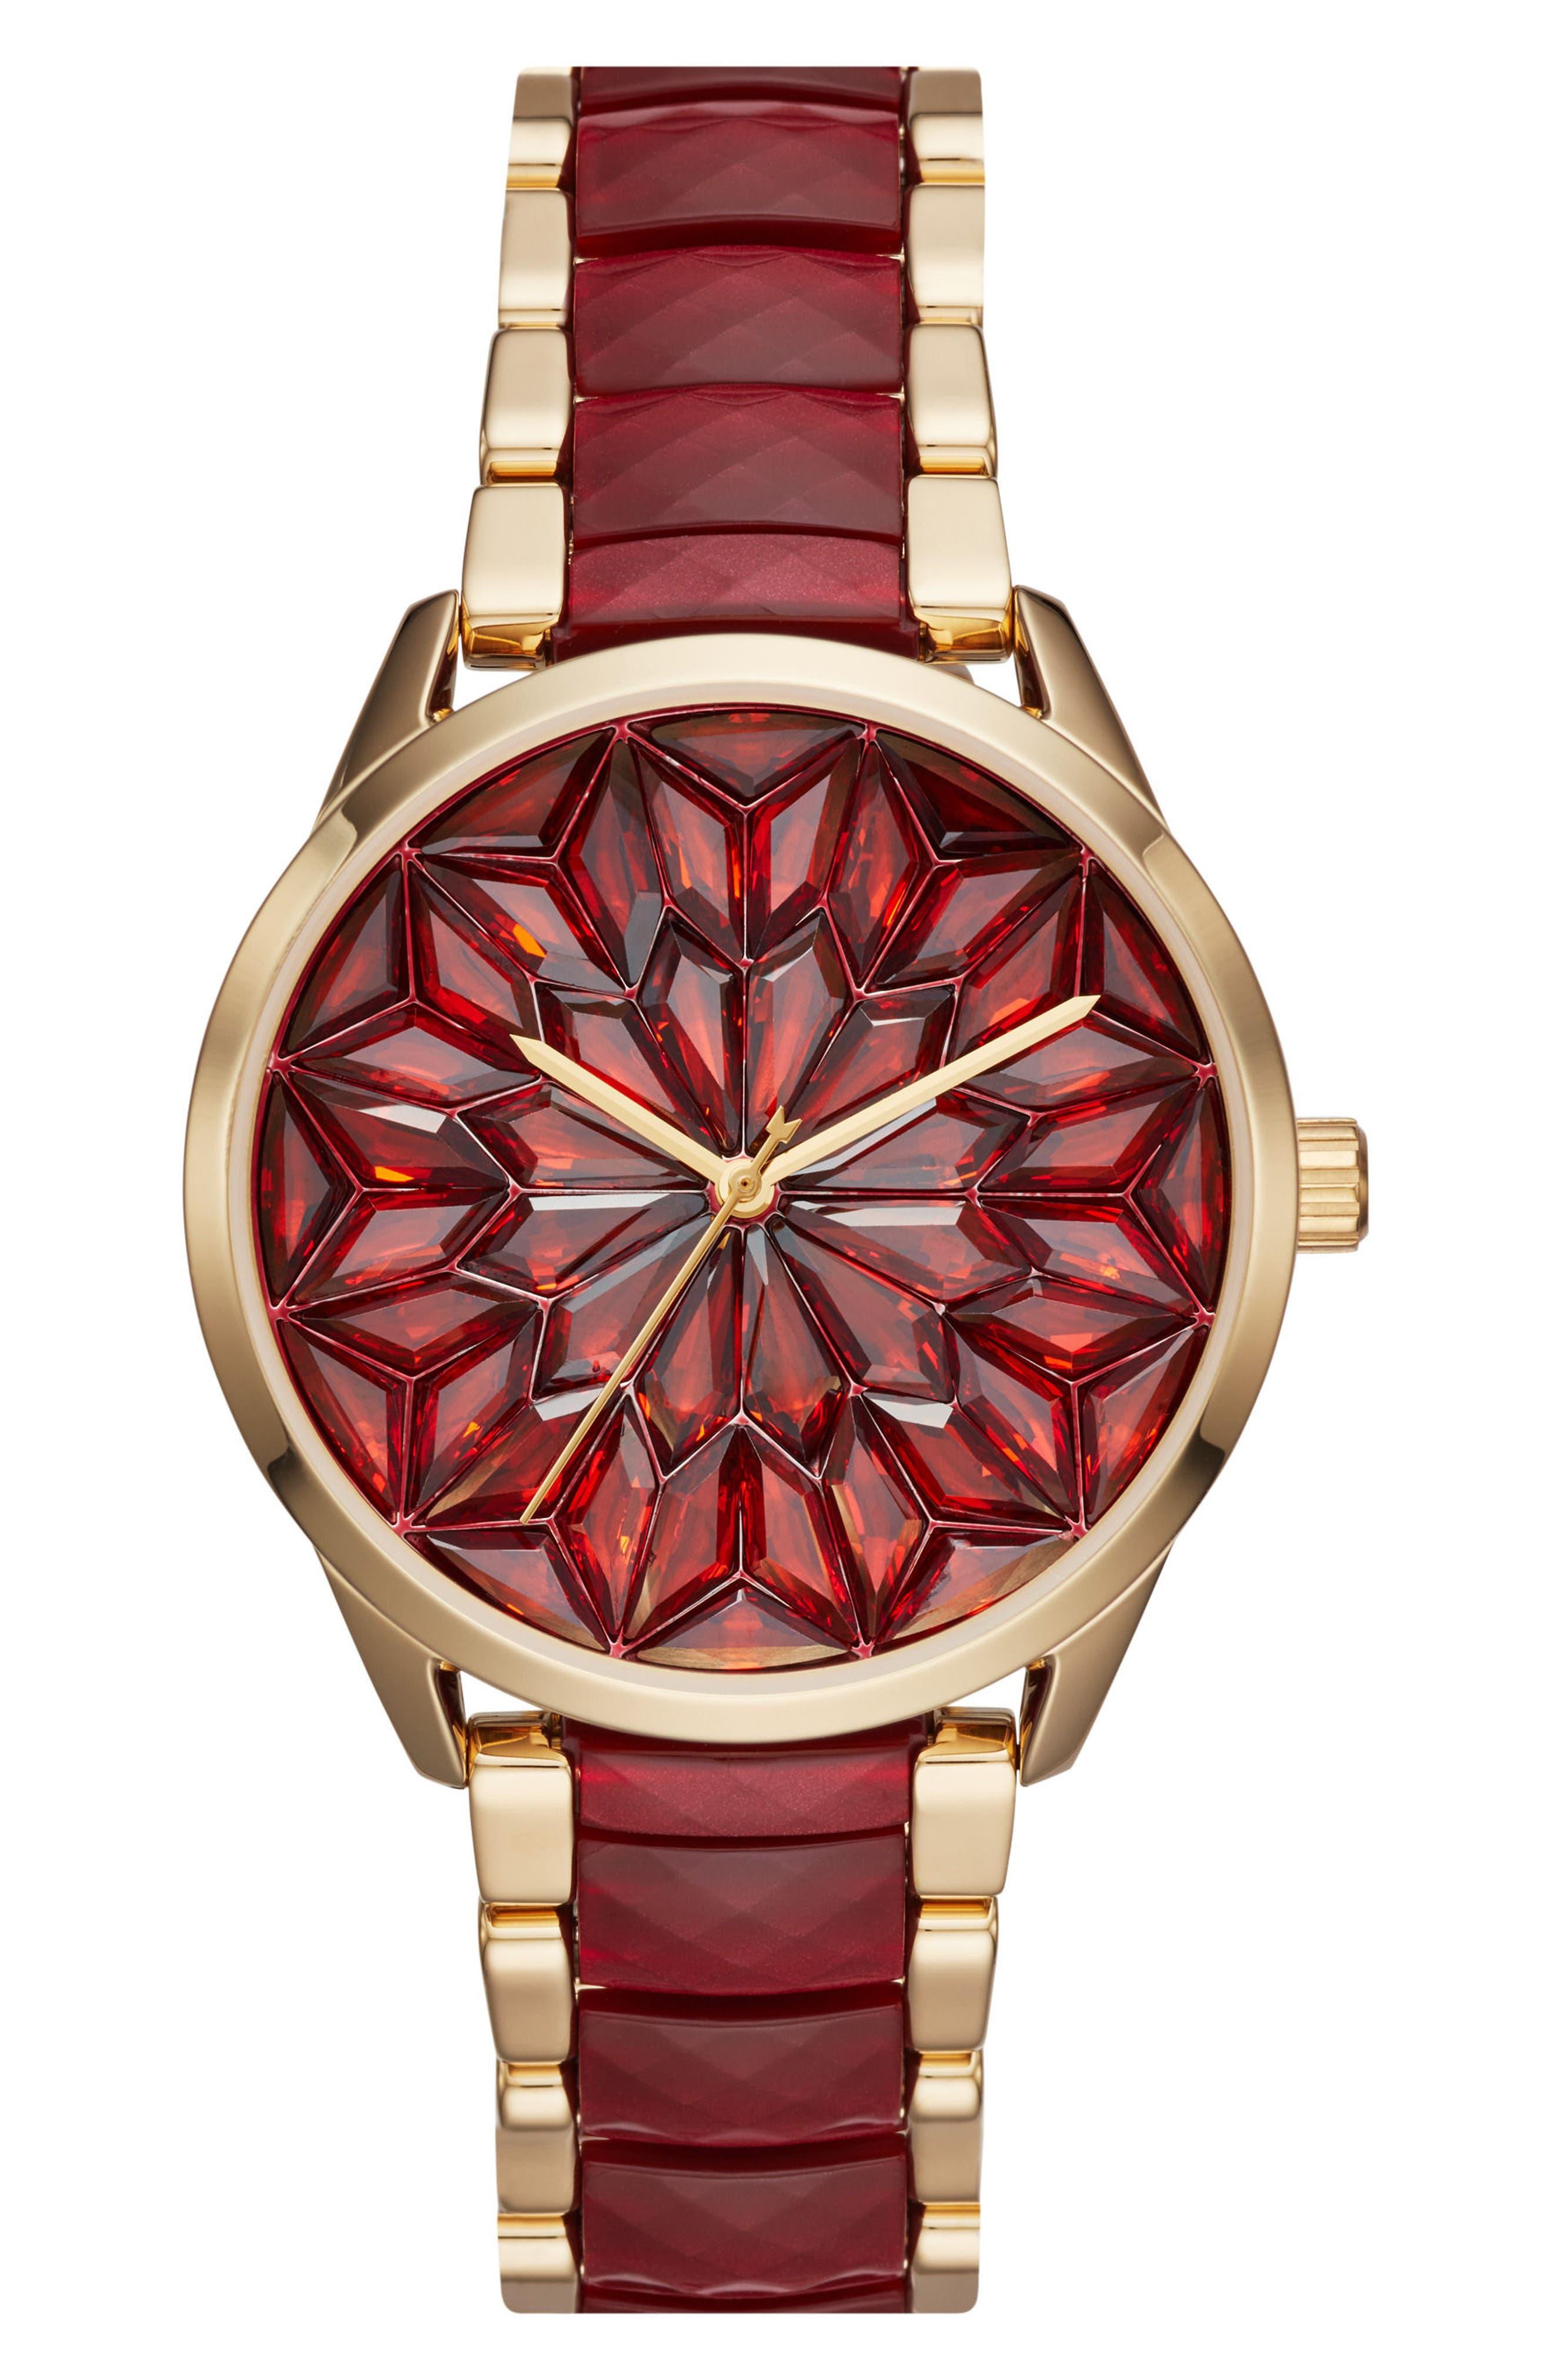 Main Image - Michael Kors Slater Jewel Dial Bracelet Watch, 40mm